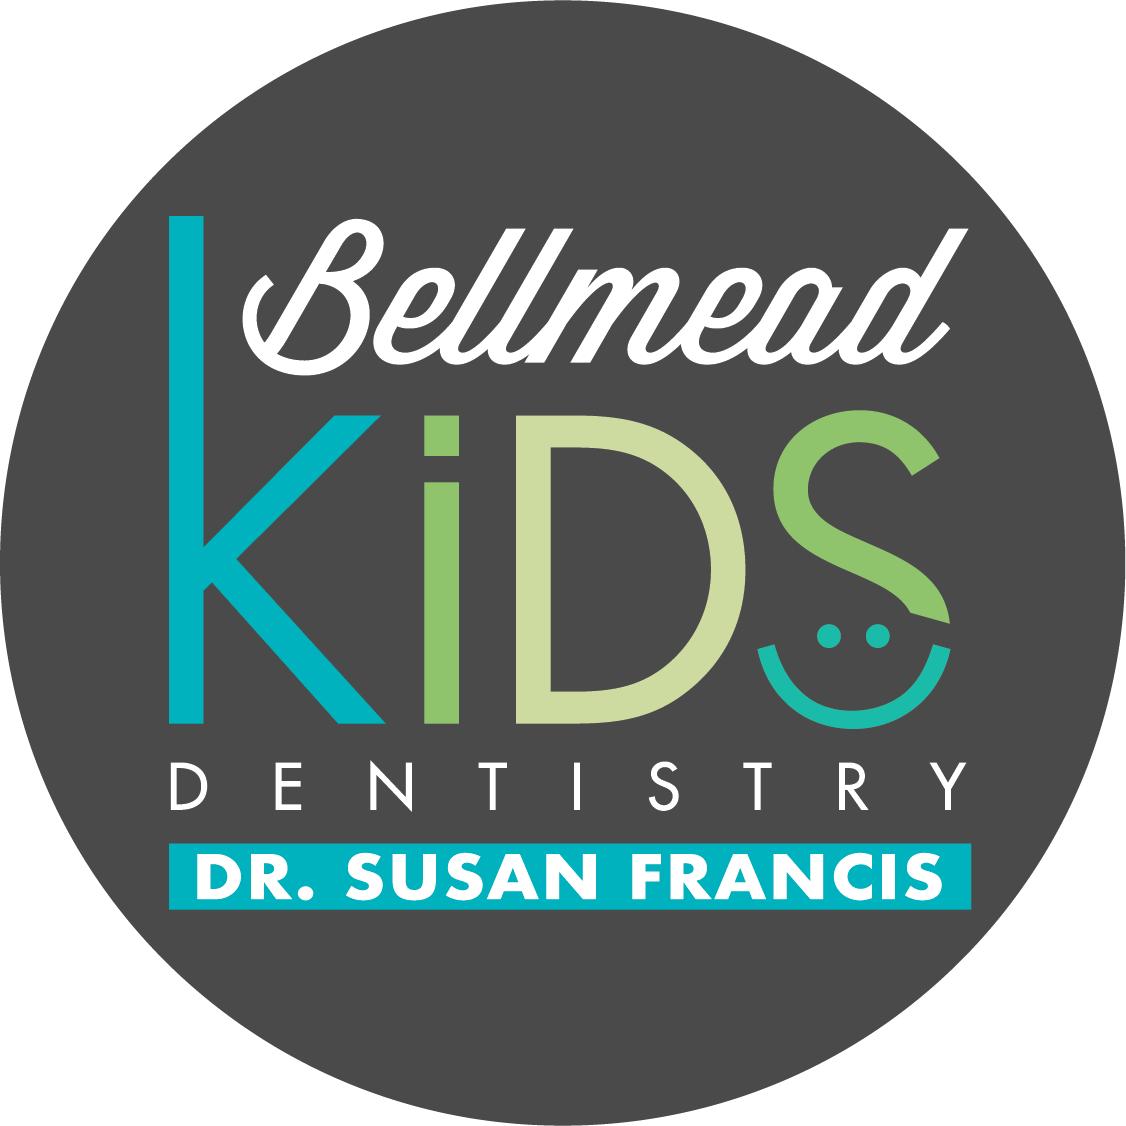 Bellmead Kids Dentistry